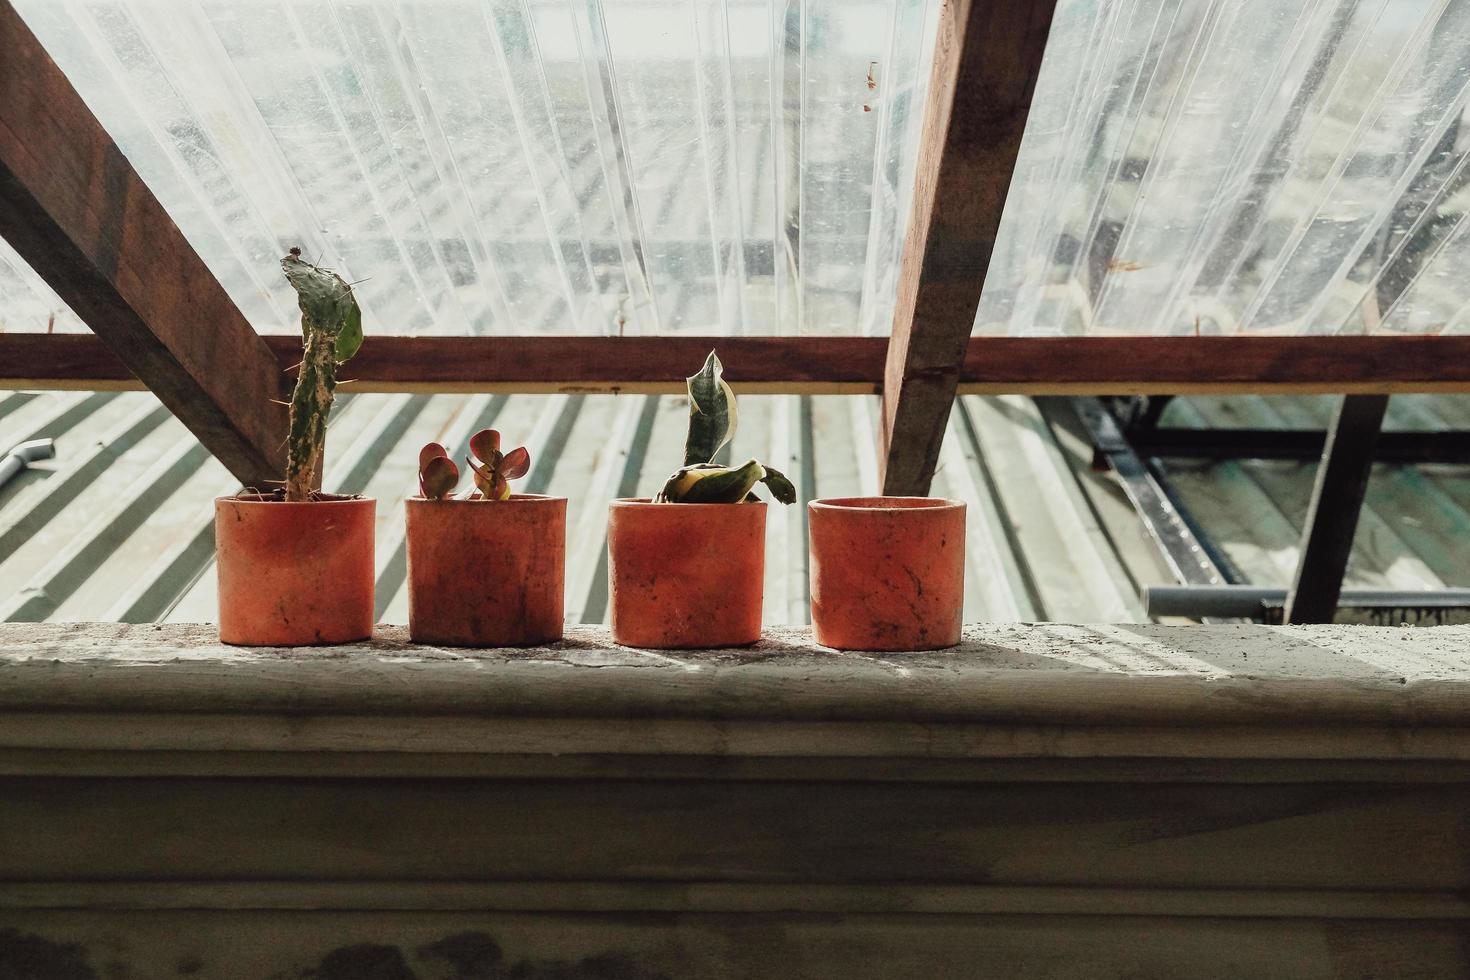 gröna växter i lerkrukor foto